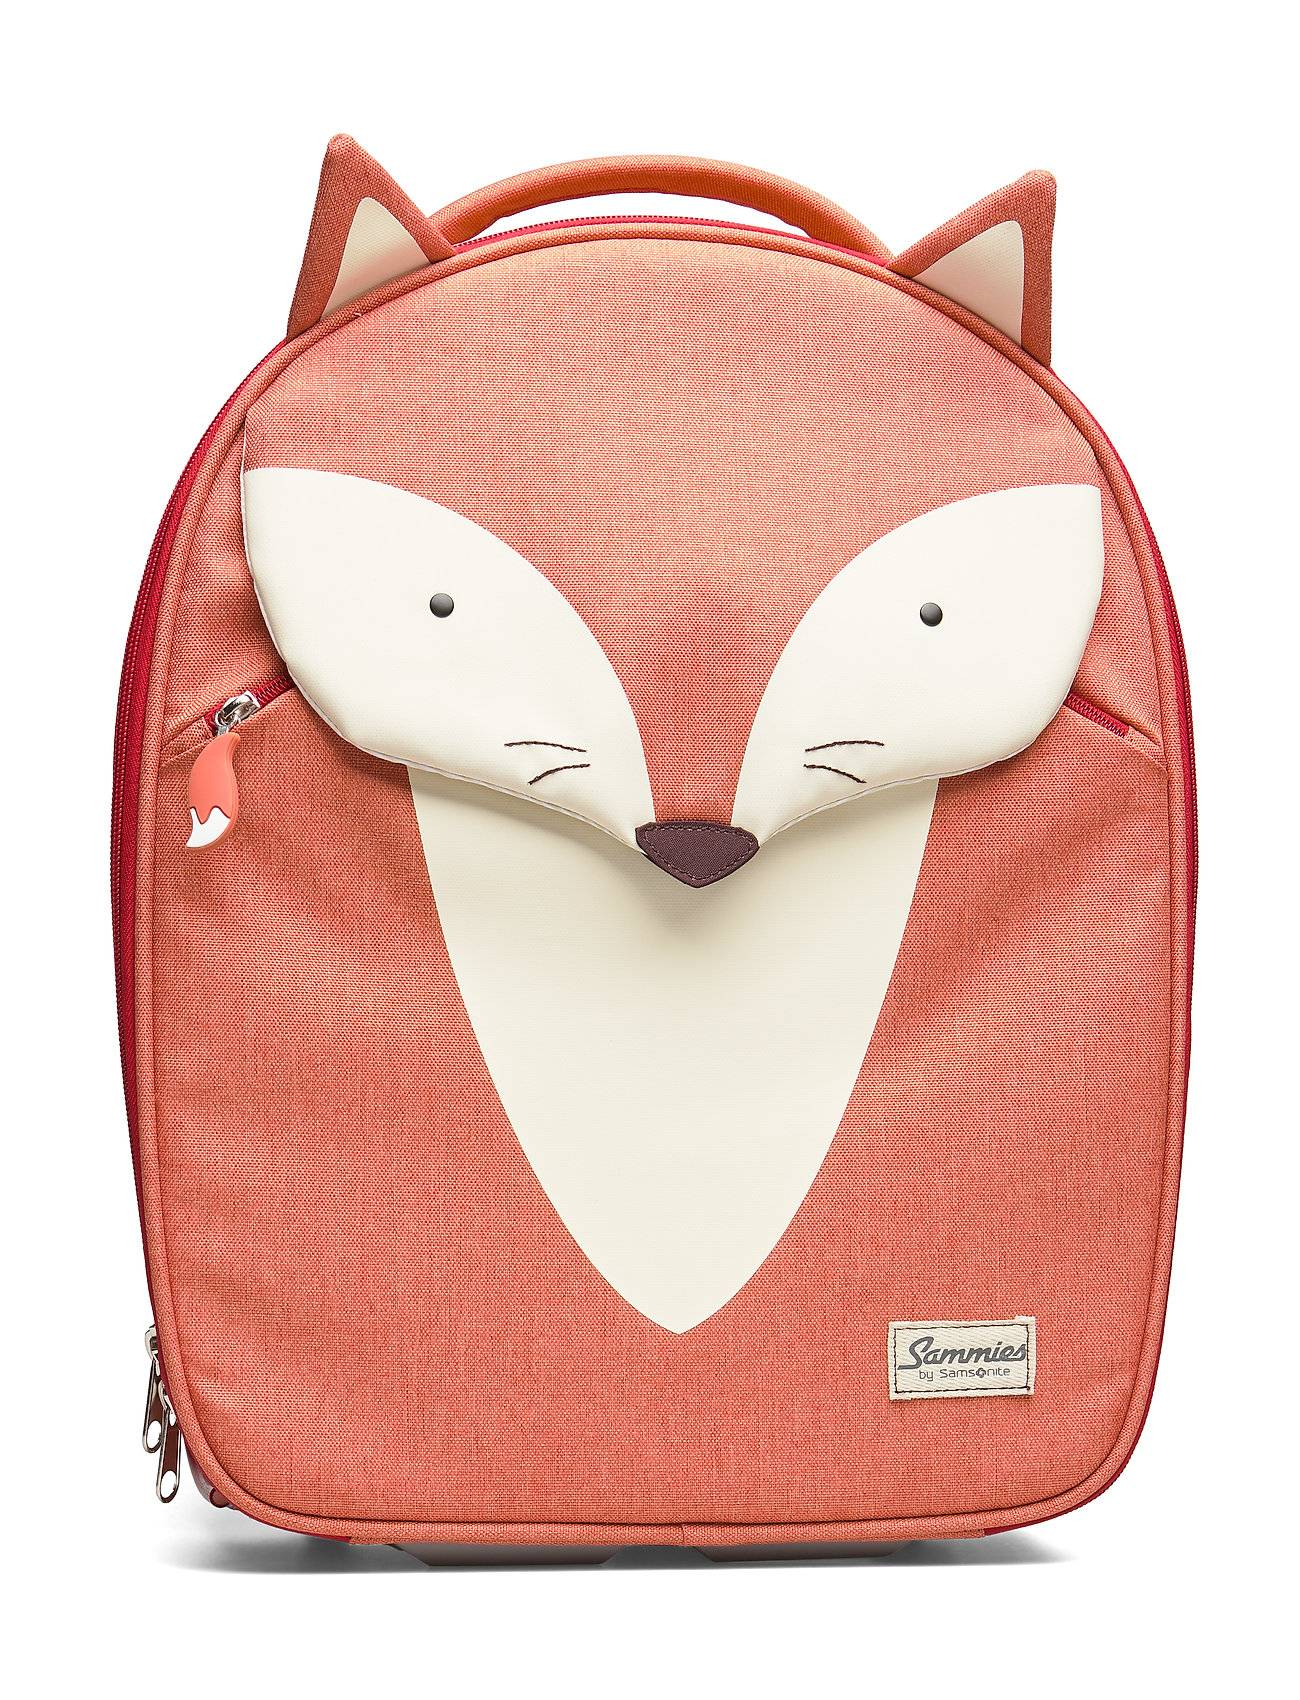 Samsonite Happy Sammies Upright 45 Fox William Accessories Bags Backpacks Vaaleanpunainen